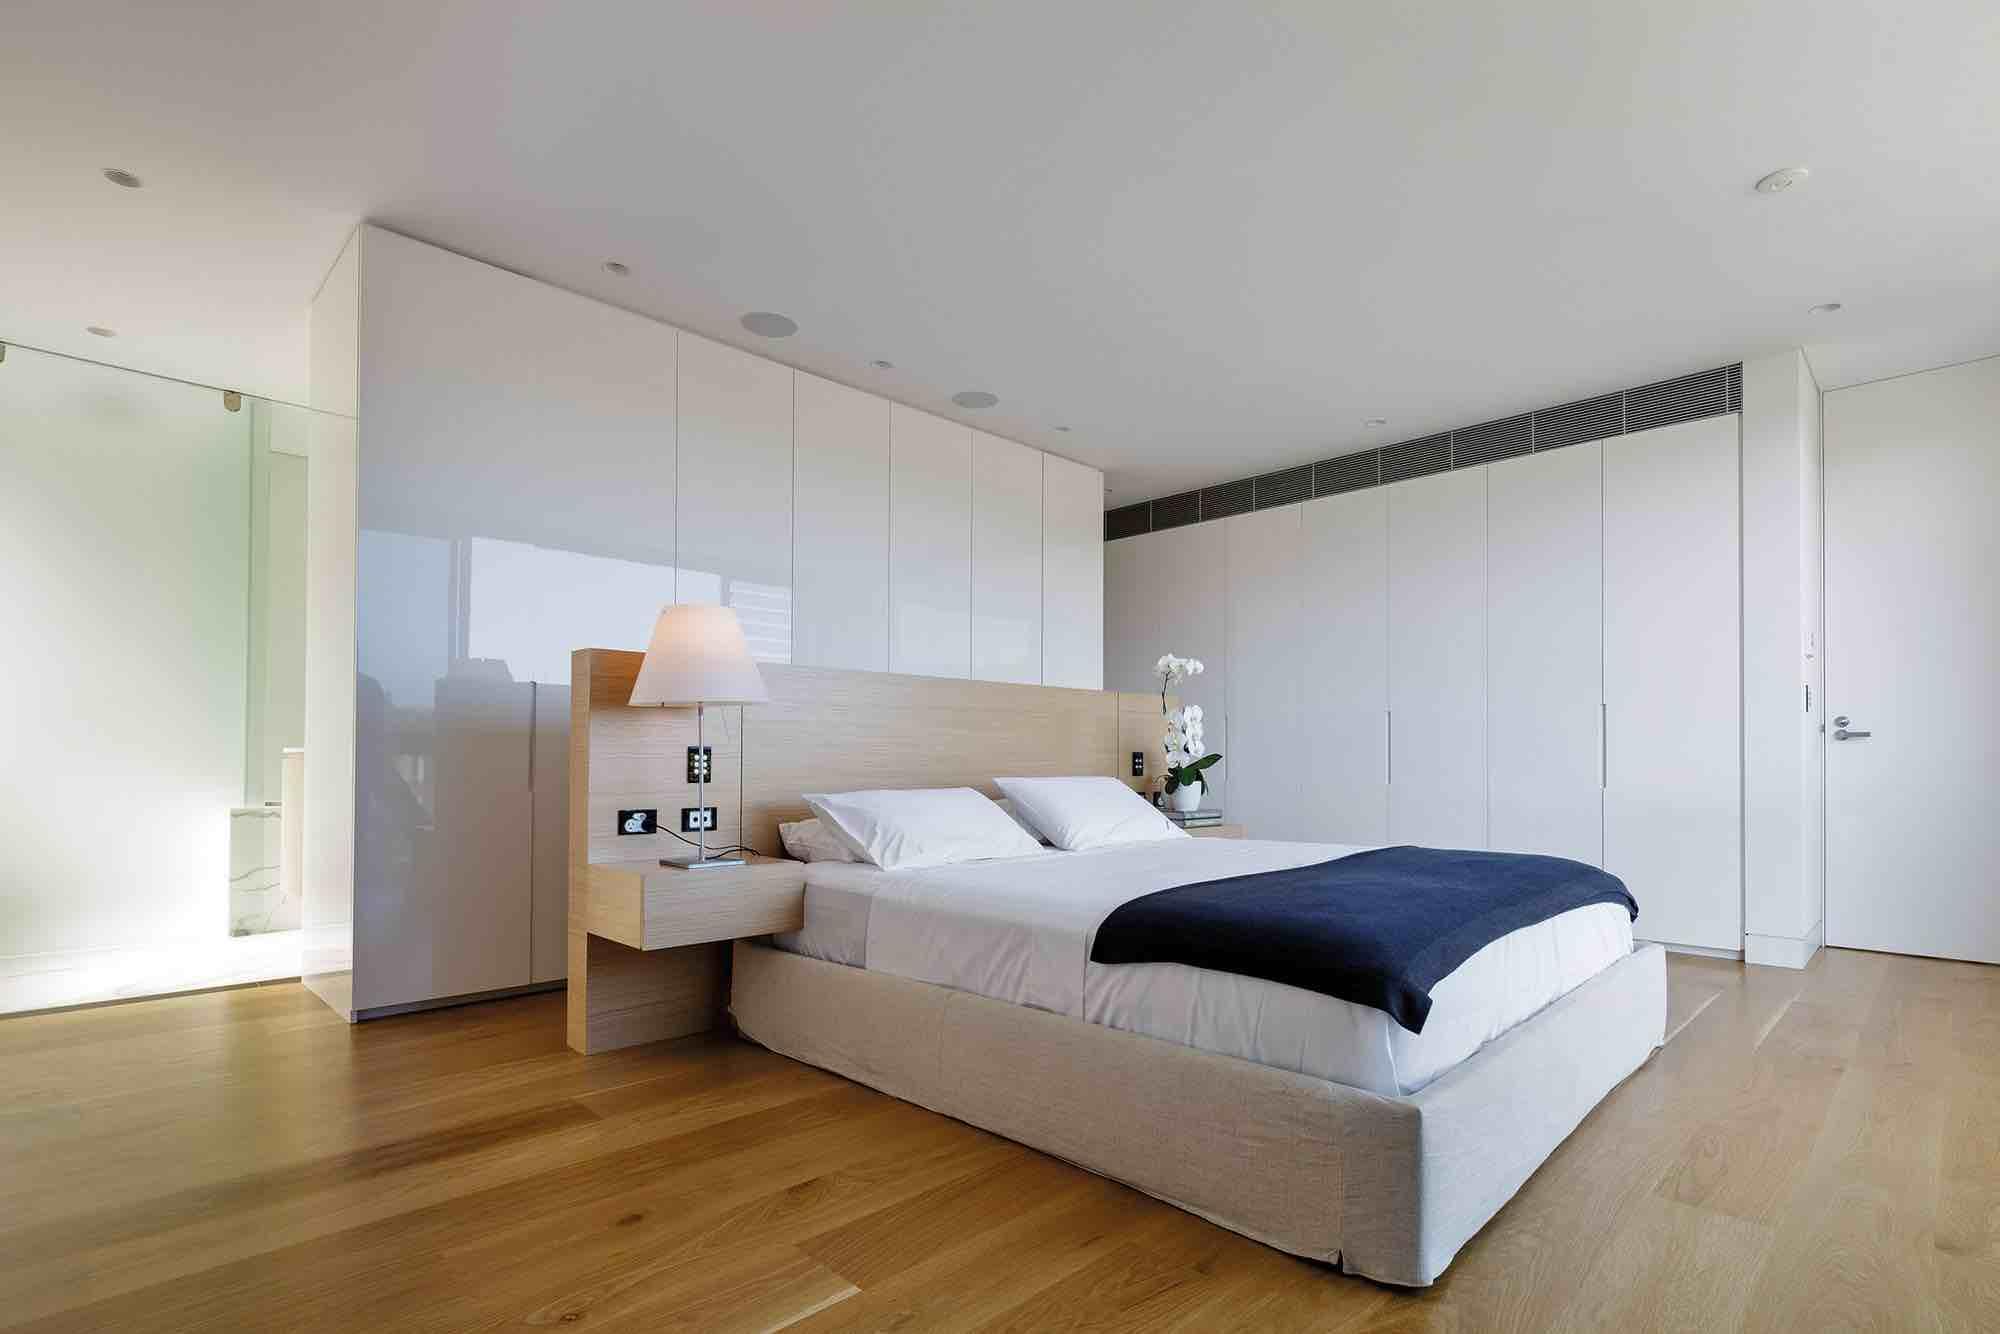 hewlett-street-house-mpr-design-group_hewlett_house08